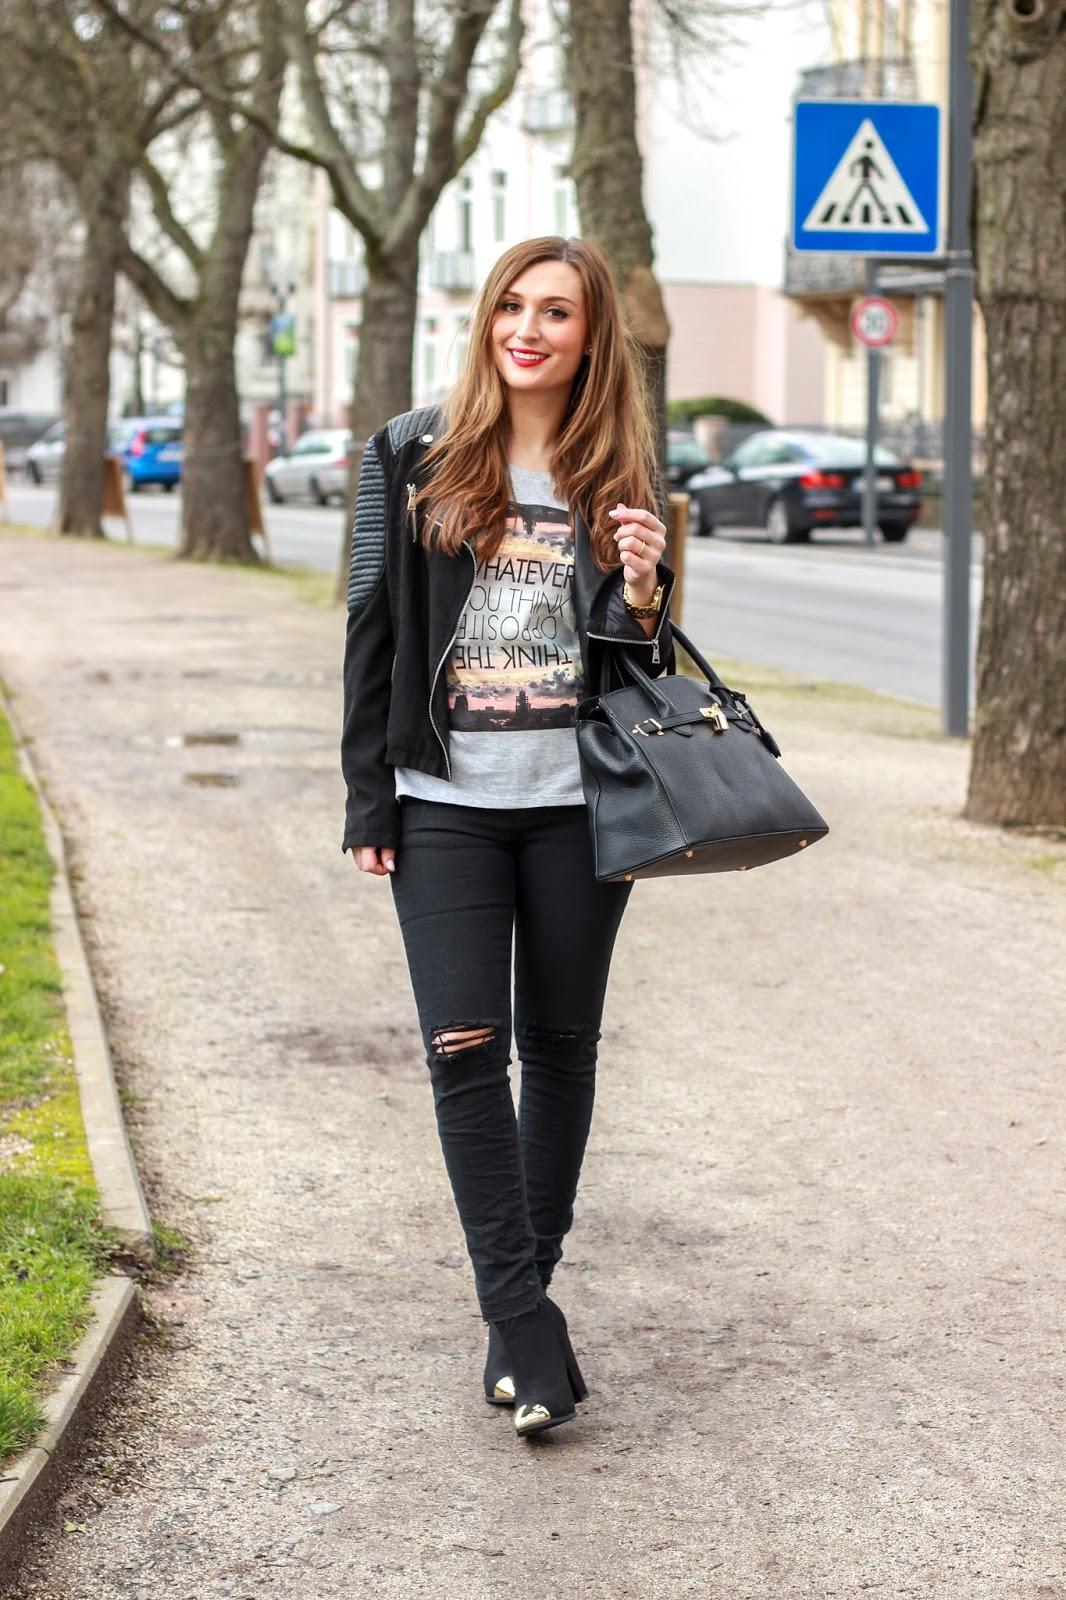 Schuhe von Just Fab - Just Fab Schuhe - Outfitinspiration - Fashionstylebyjohanna - Streetstyle - Lookbook - Deutsche Fashionblogger - Frankfurt Fashionblogger - Fashionblogger aus Deutschland - Lifestyleblogger